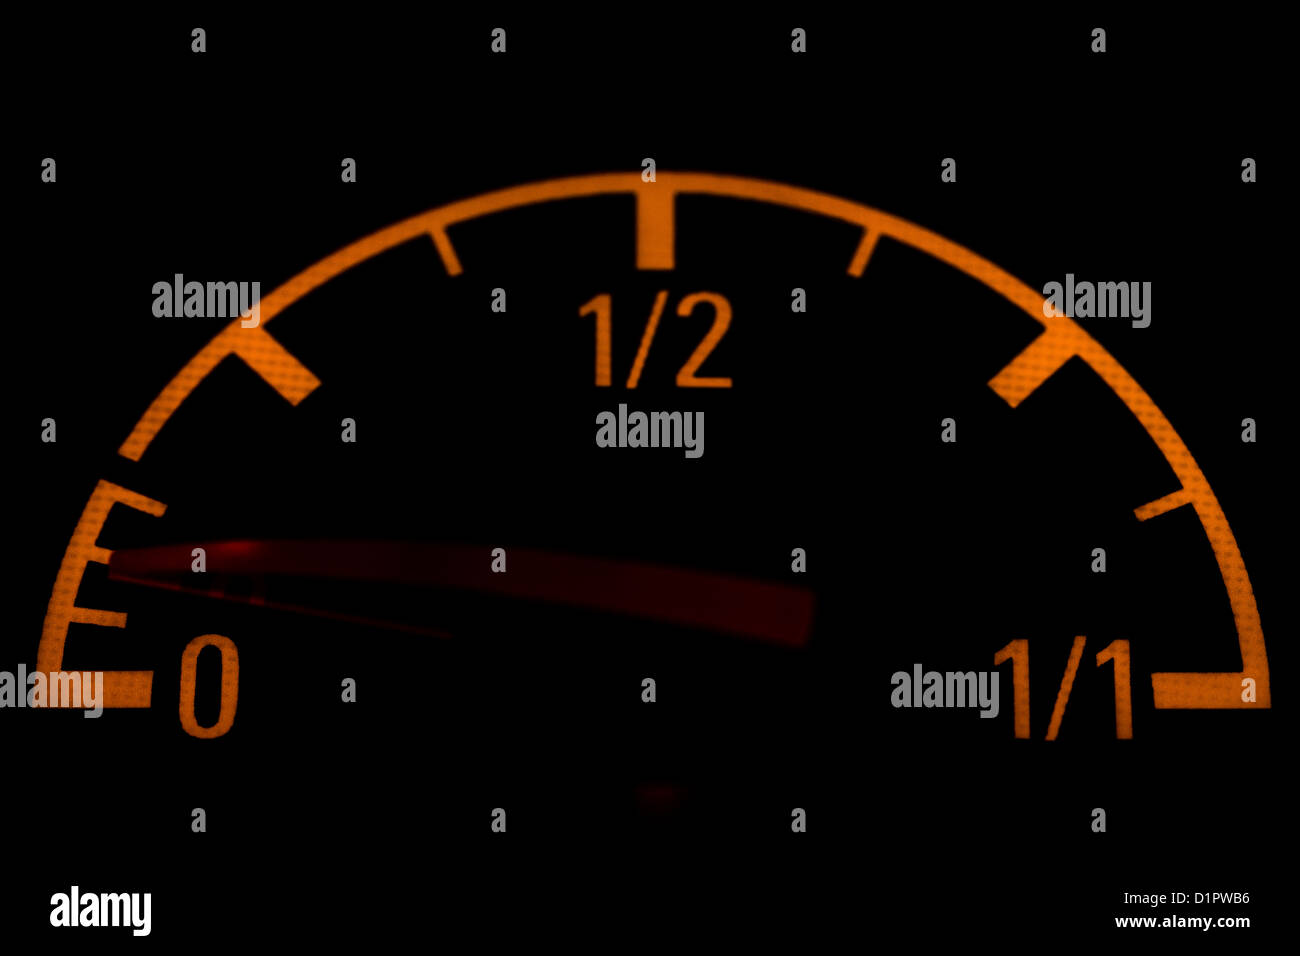 Car indicators - Stock Image